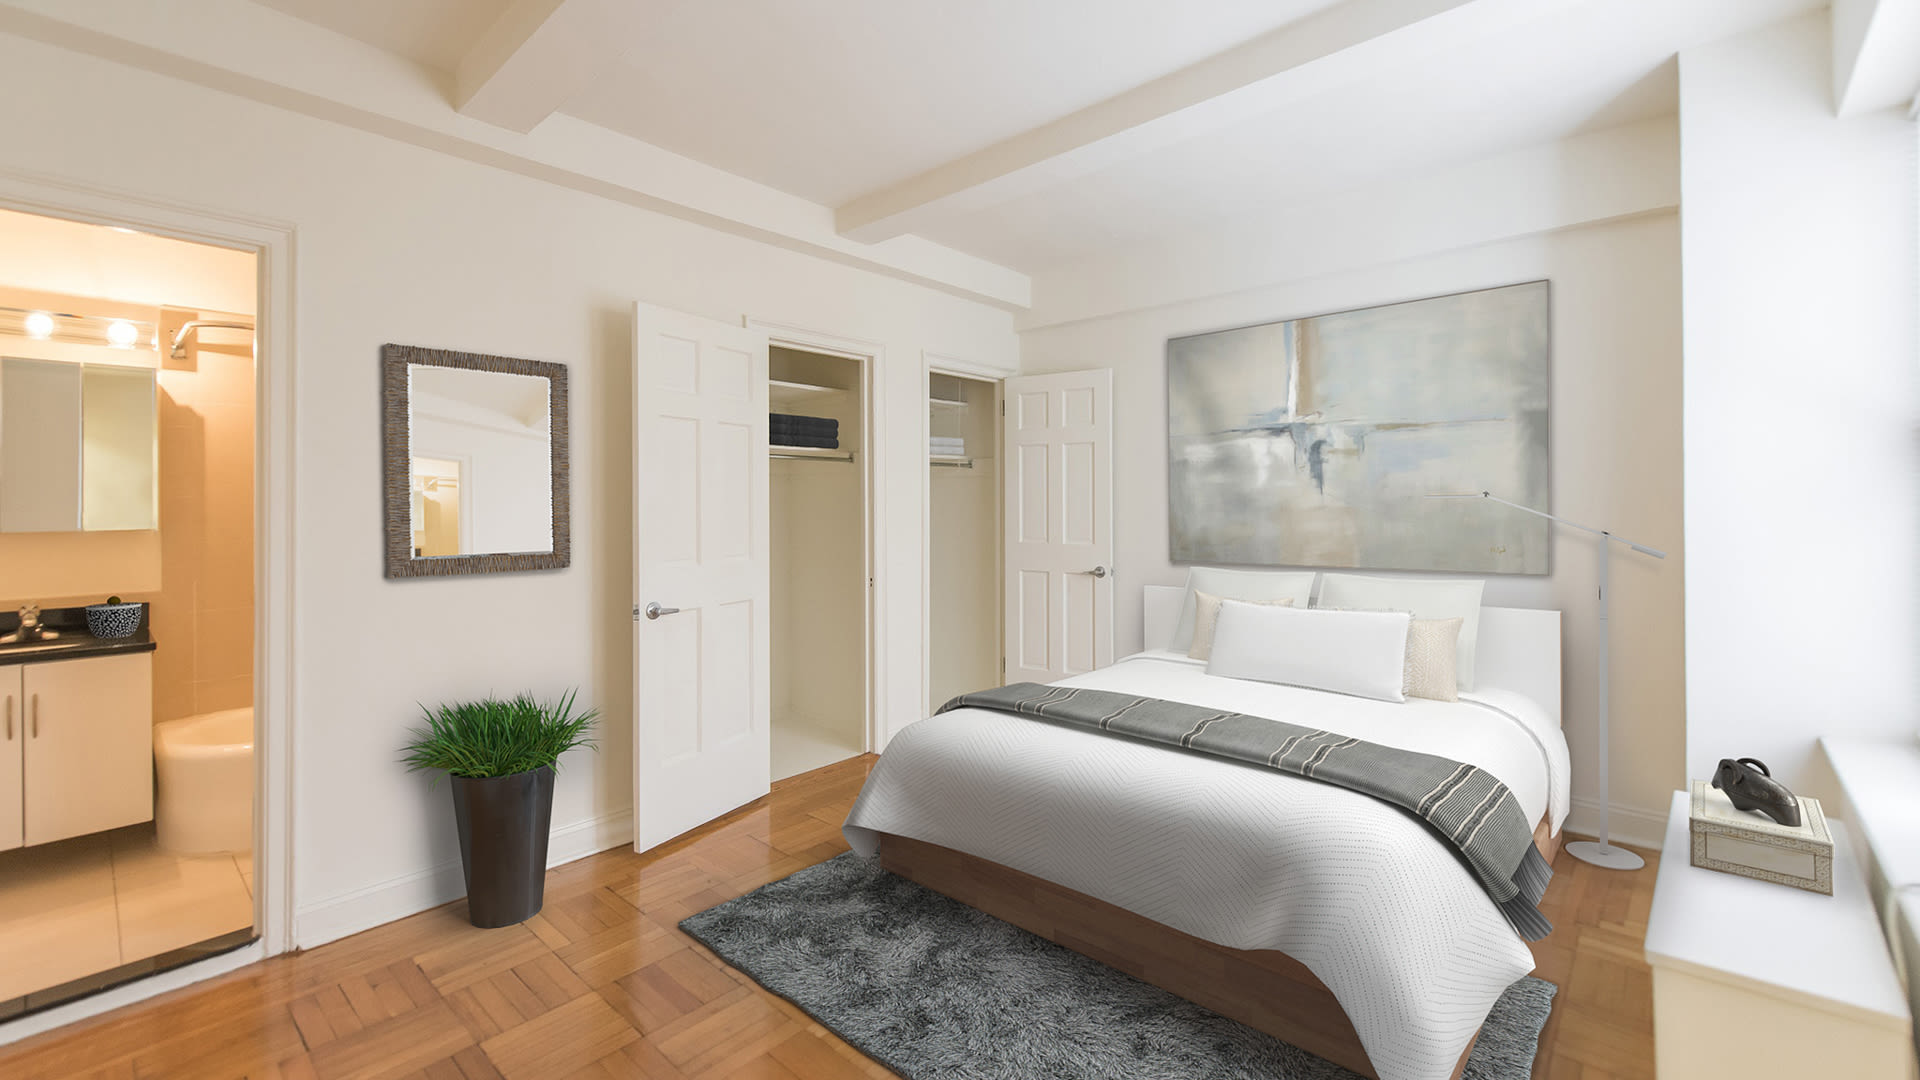 Parc Cameron Apartments - Bedroom with Parquet Flooring